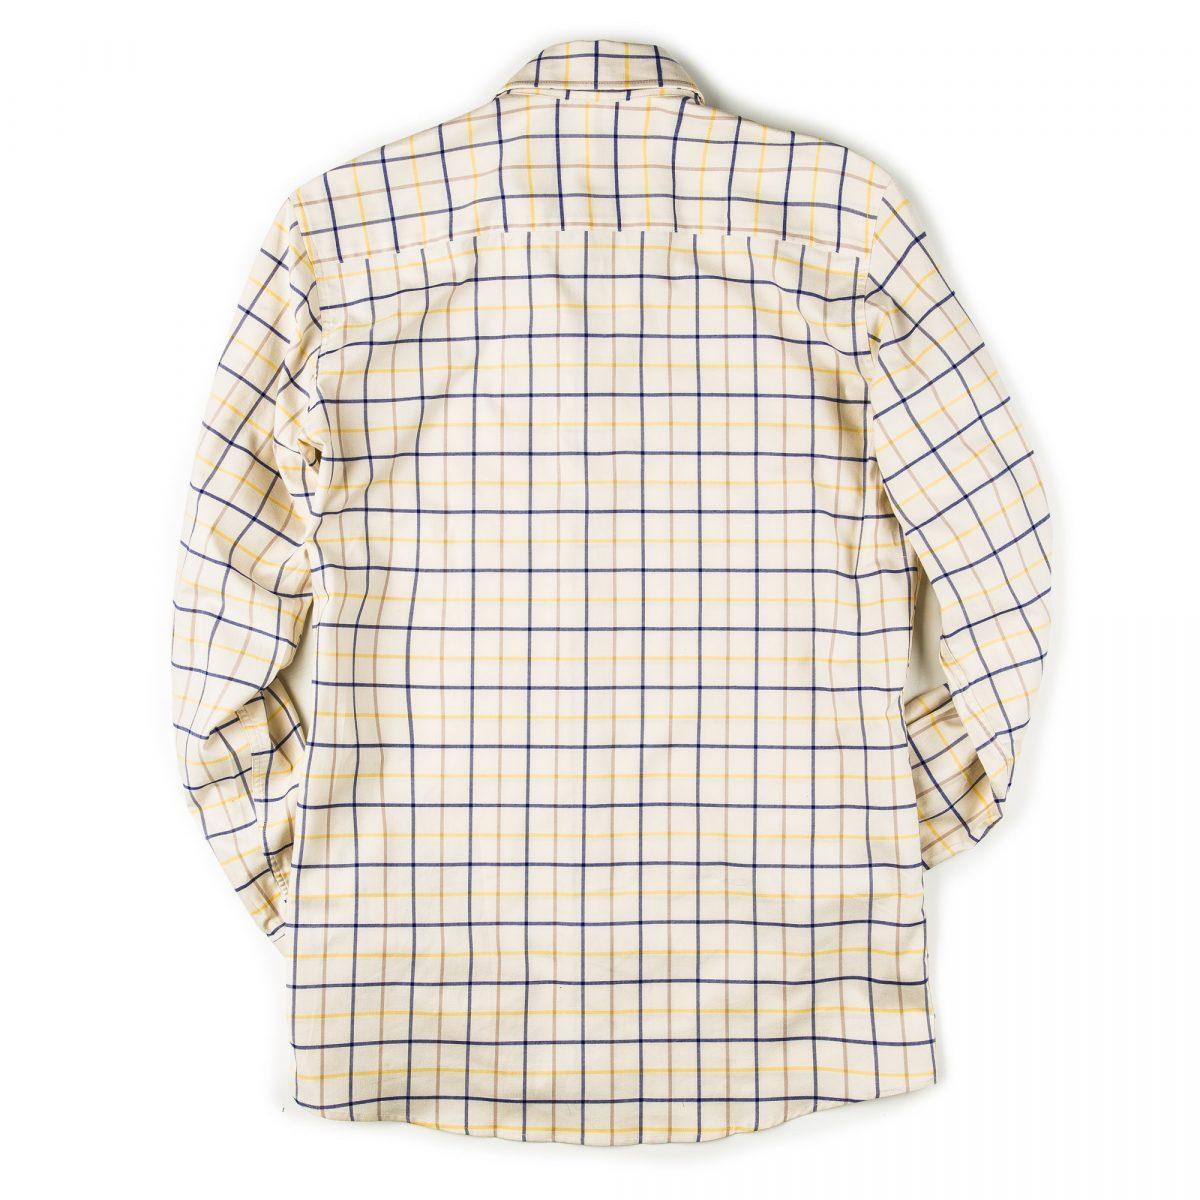 wr_co_shirts-21391-edit